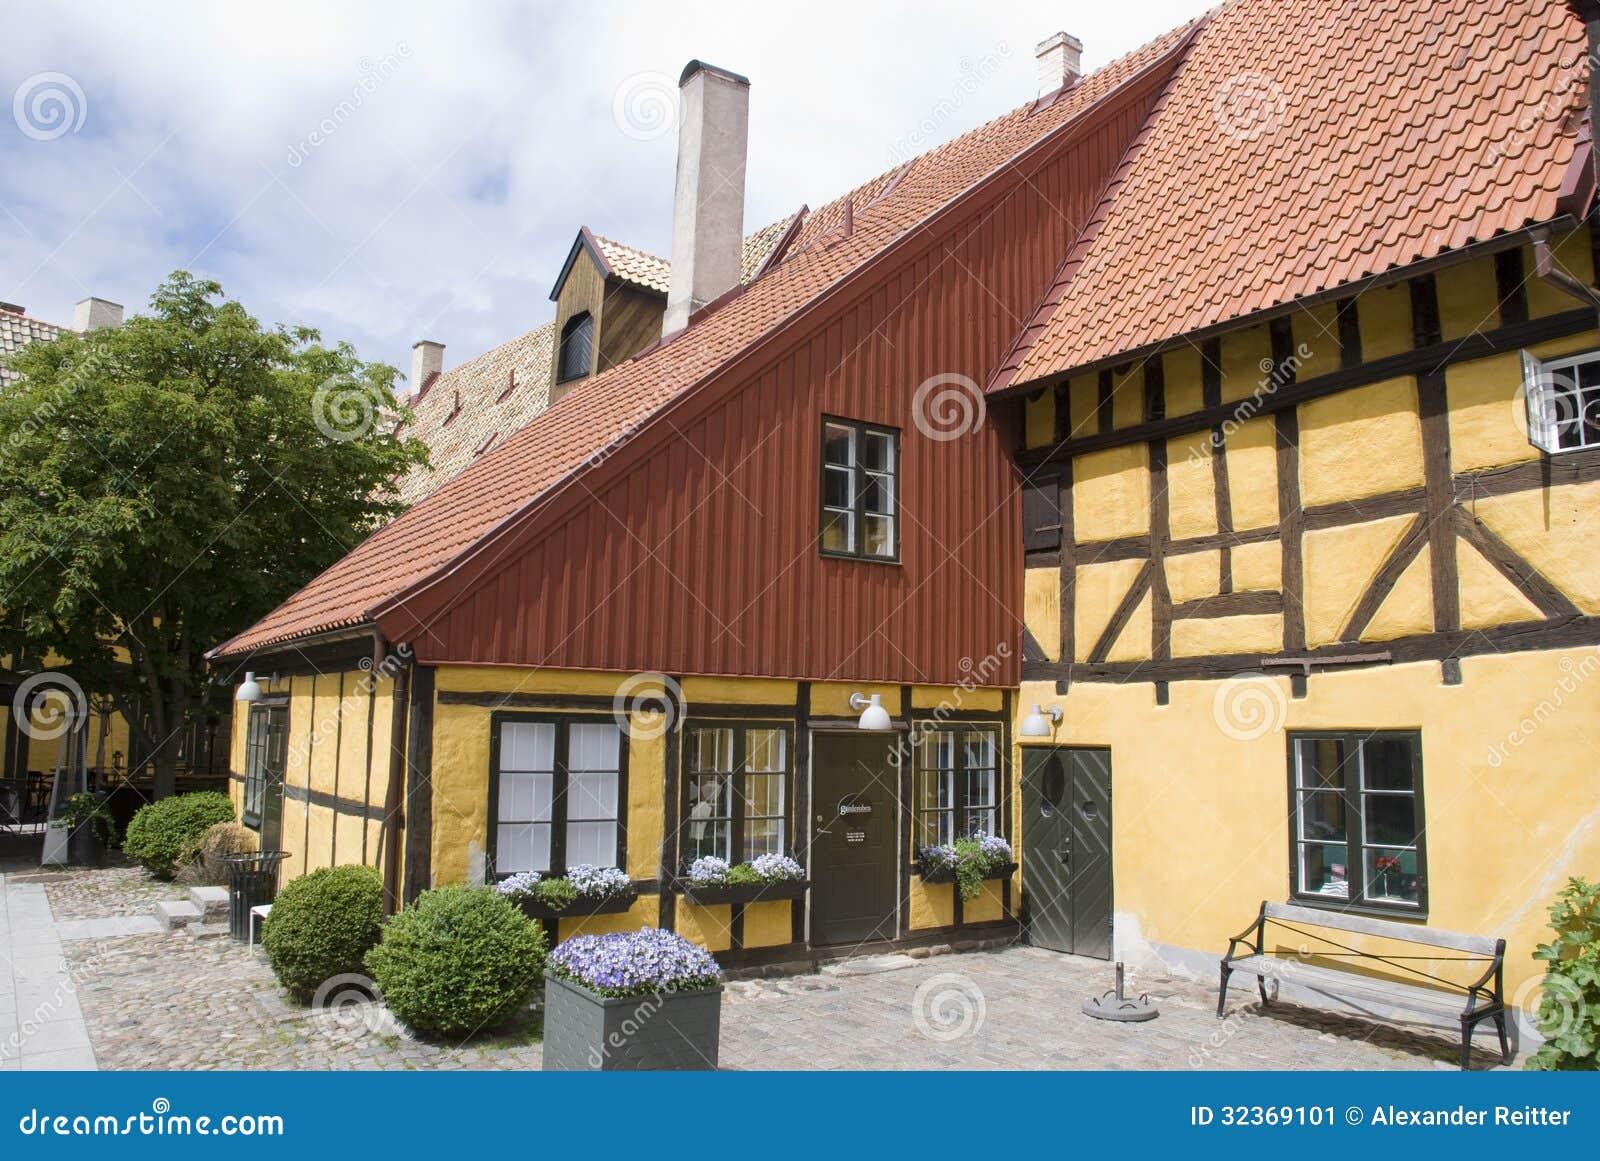 maison scandinave jaune image stock image du architecture 32369101. Black Bedroom Furniture Sets. Home Design Ideas